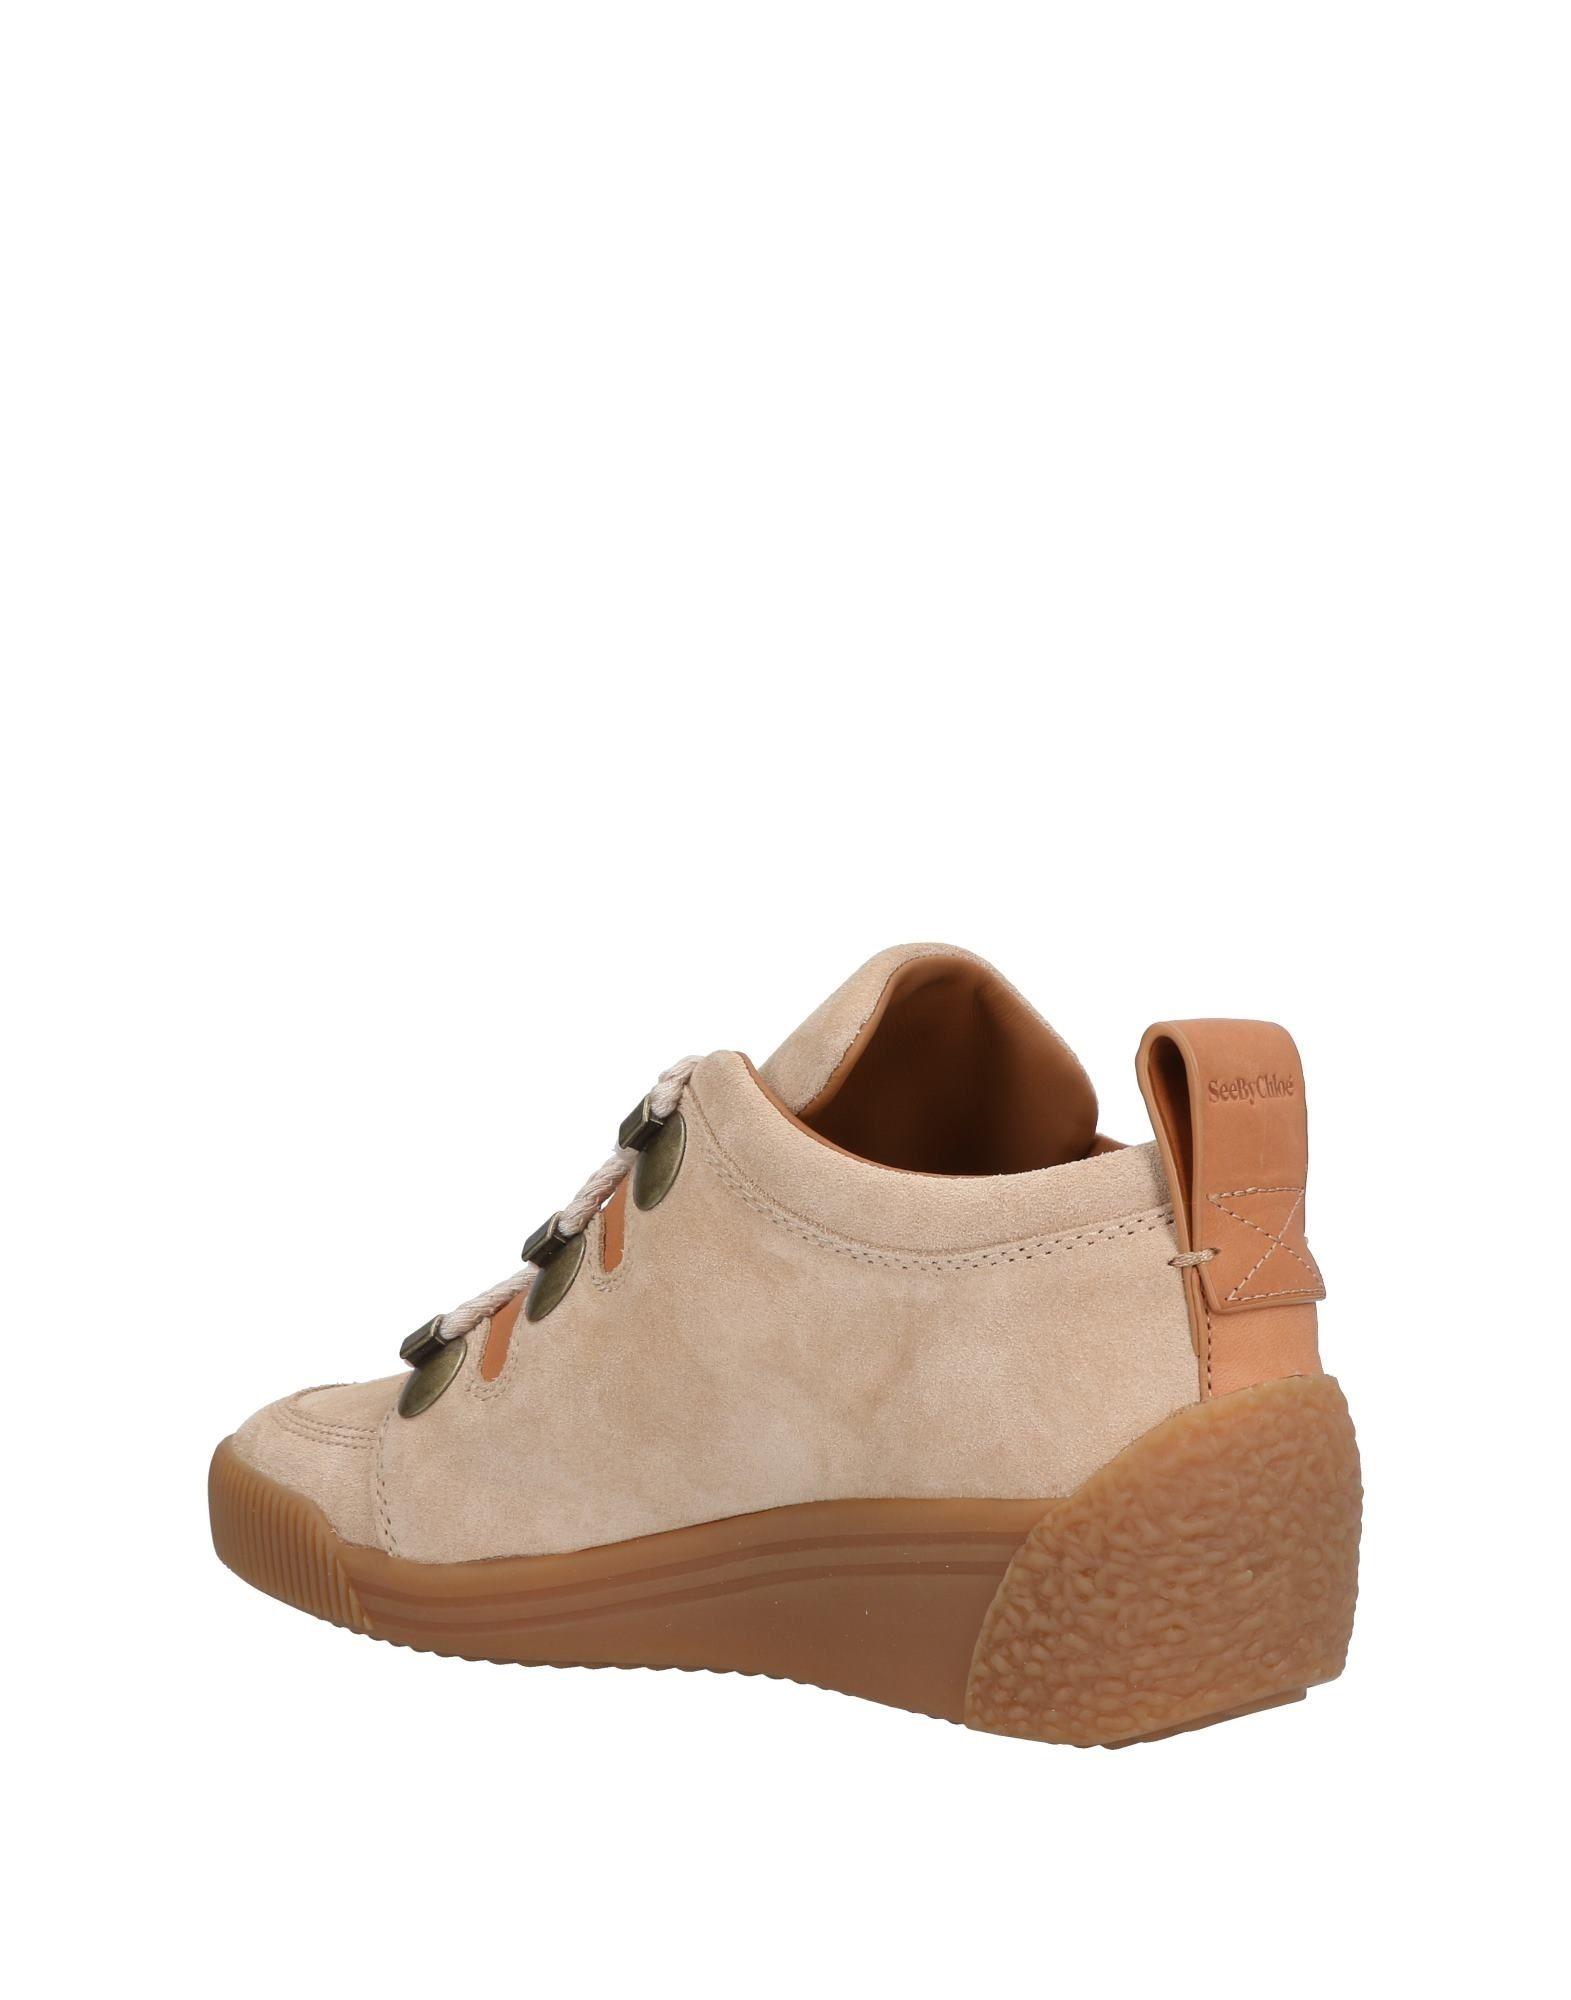 See By Chloé Damen Sneakers Damen Chloé  11483372NT Neue Schuhe fbbfcb